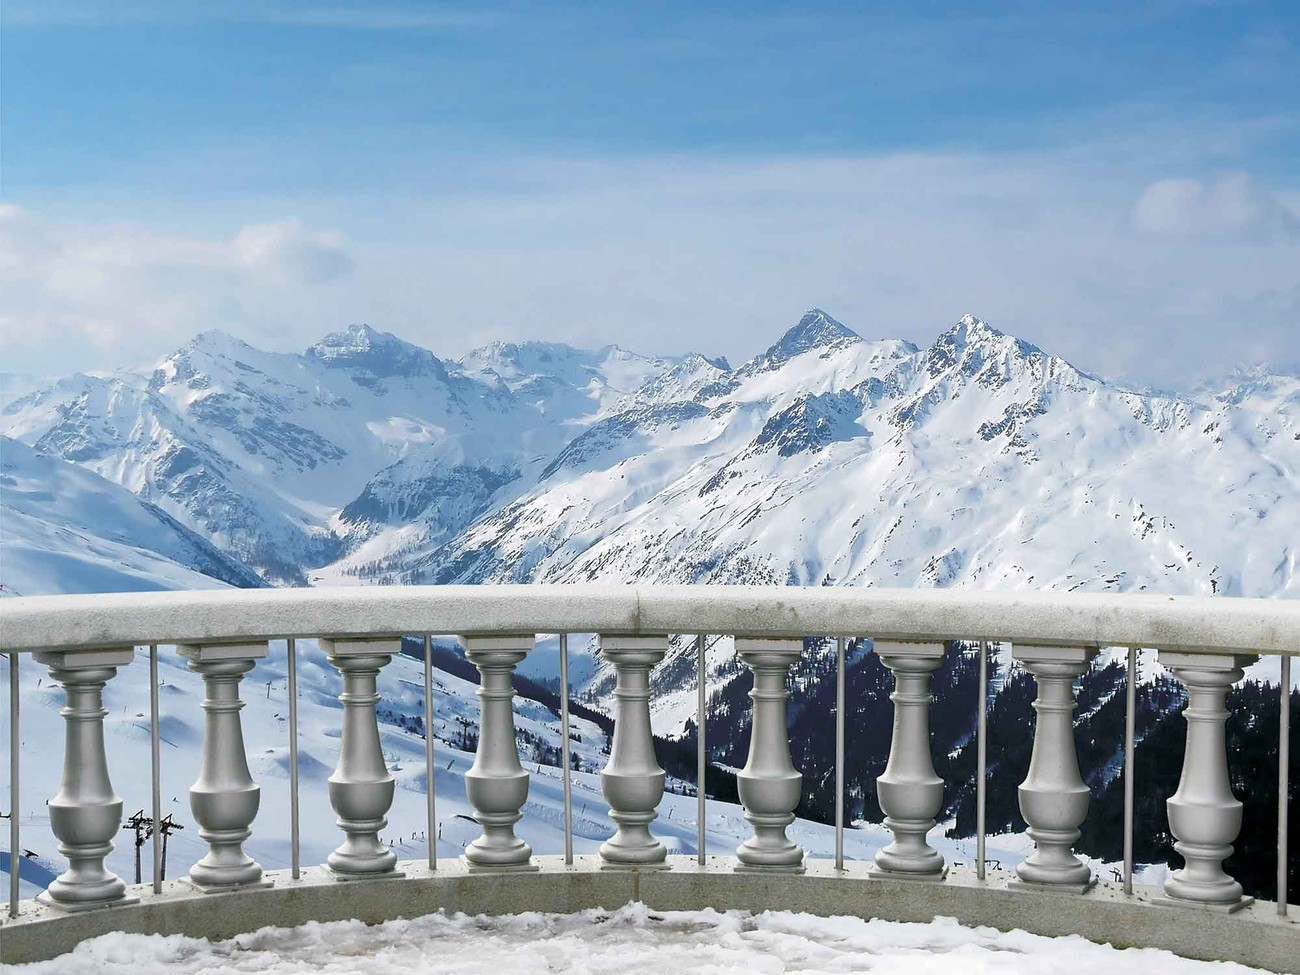 Top Wallpaper Mountain Mural - mountain-scene-i46019  Snapshot_727083.jpg